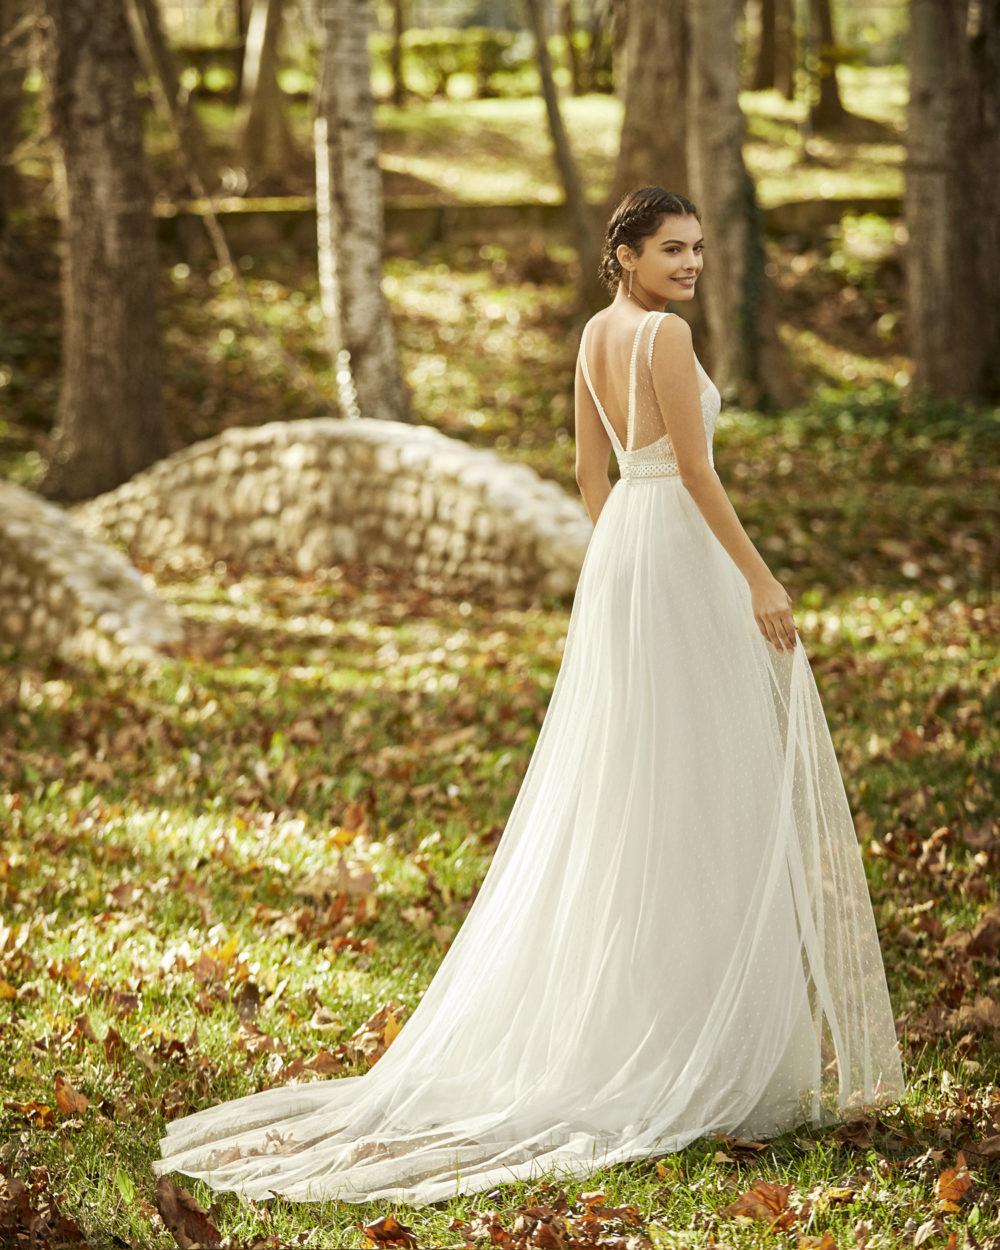 Mariages: abito da sposa Rosa Clarà 2020 a Vicenza, Verona, Padova, Veneto 4B115 OCEANIA